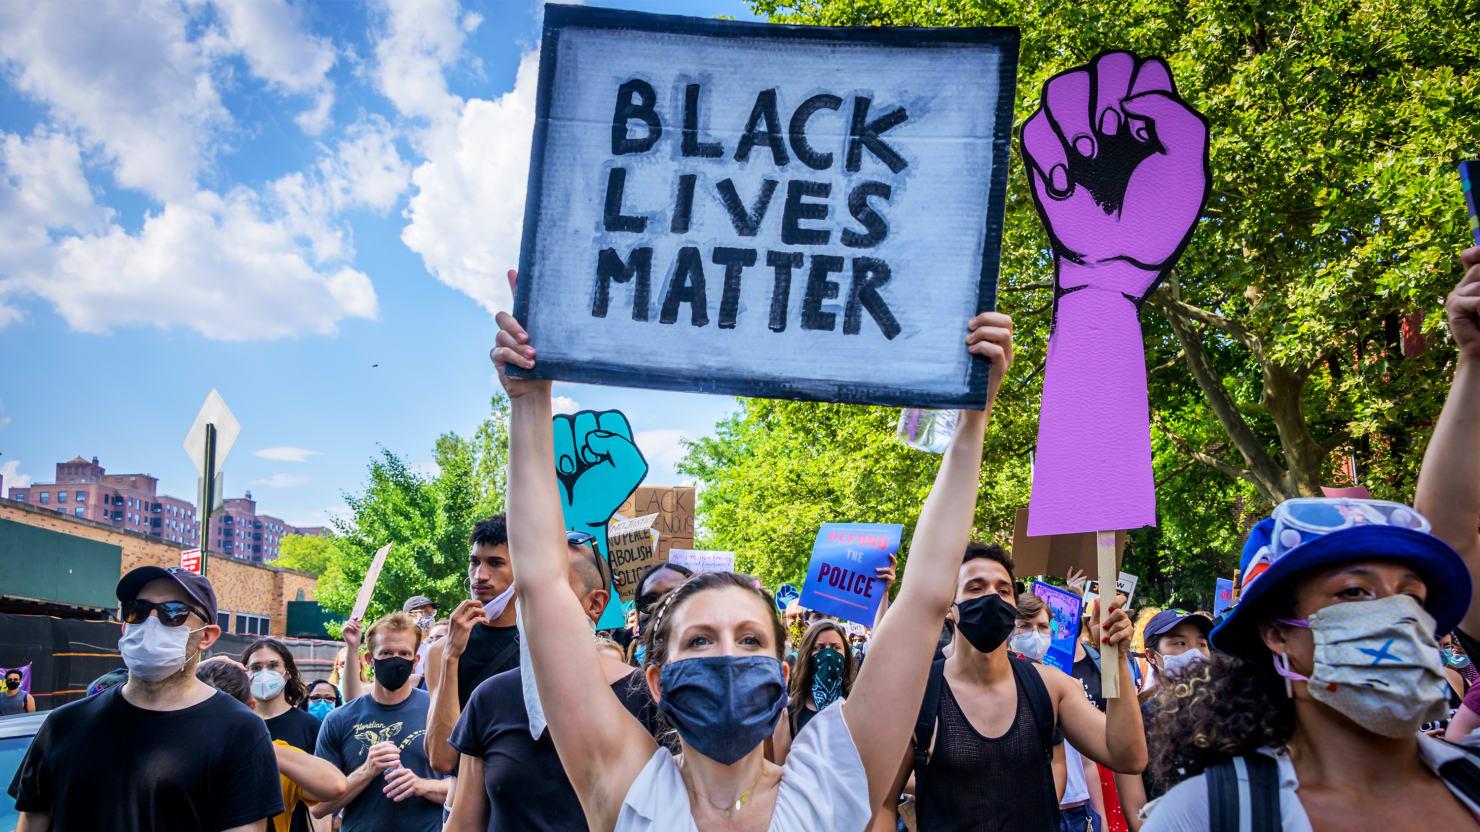 The True Perils of Protesting in 2020